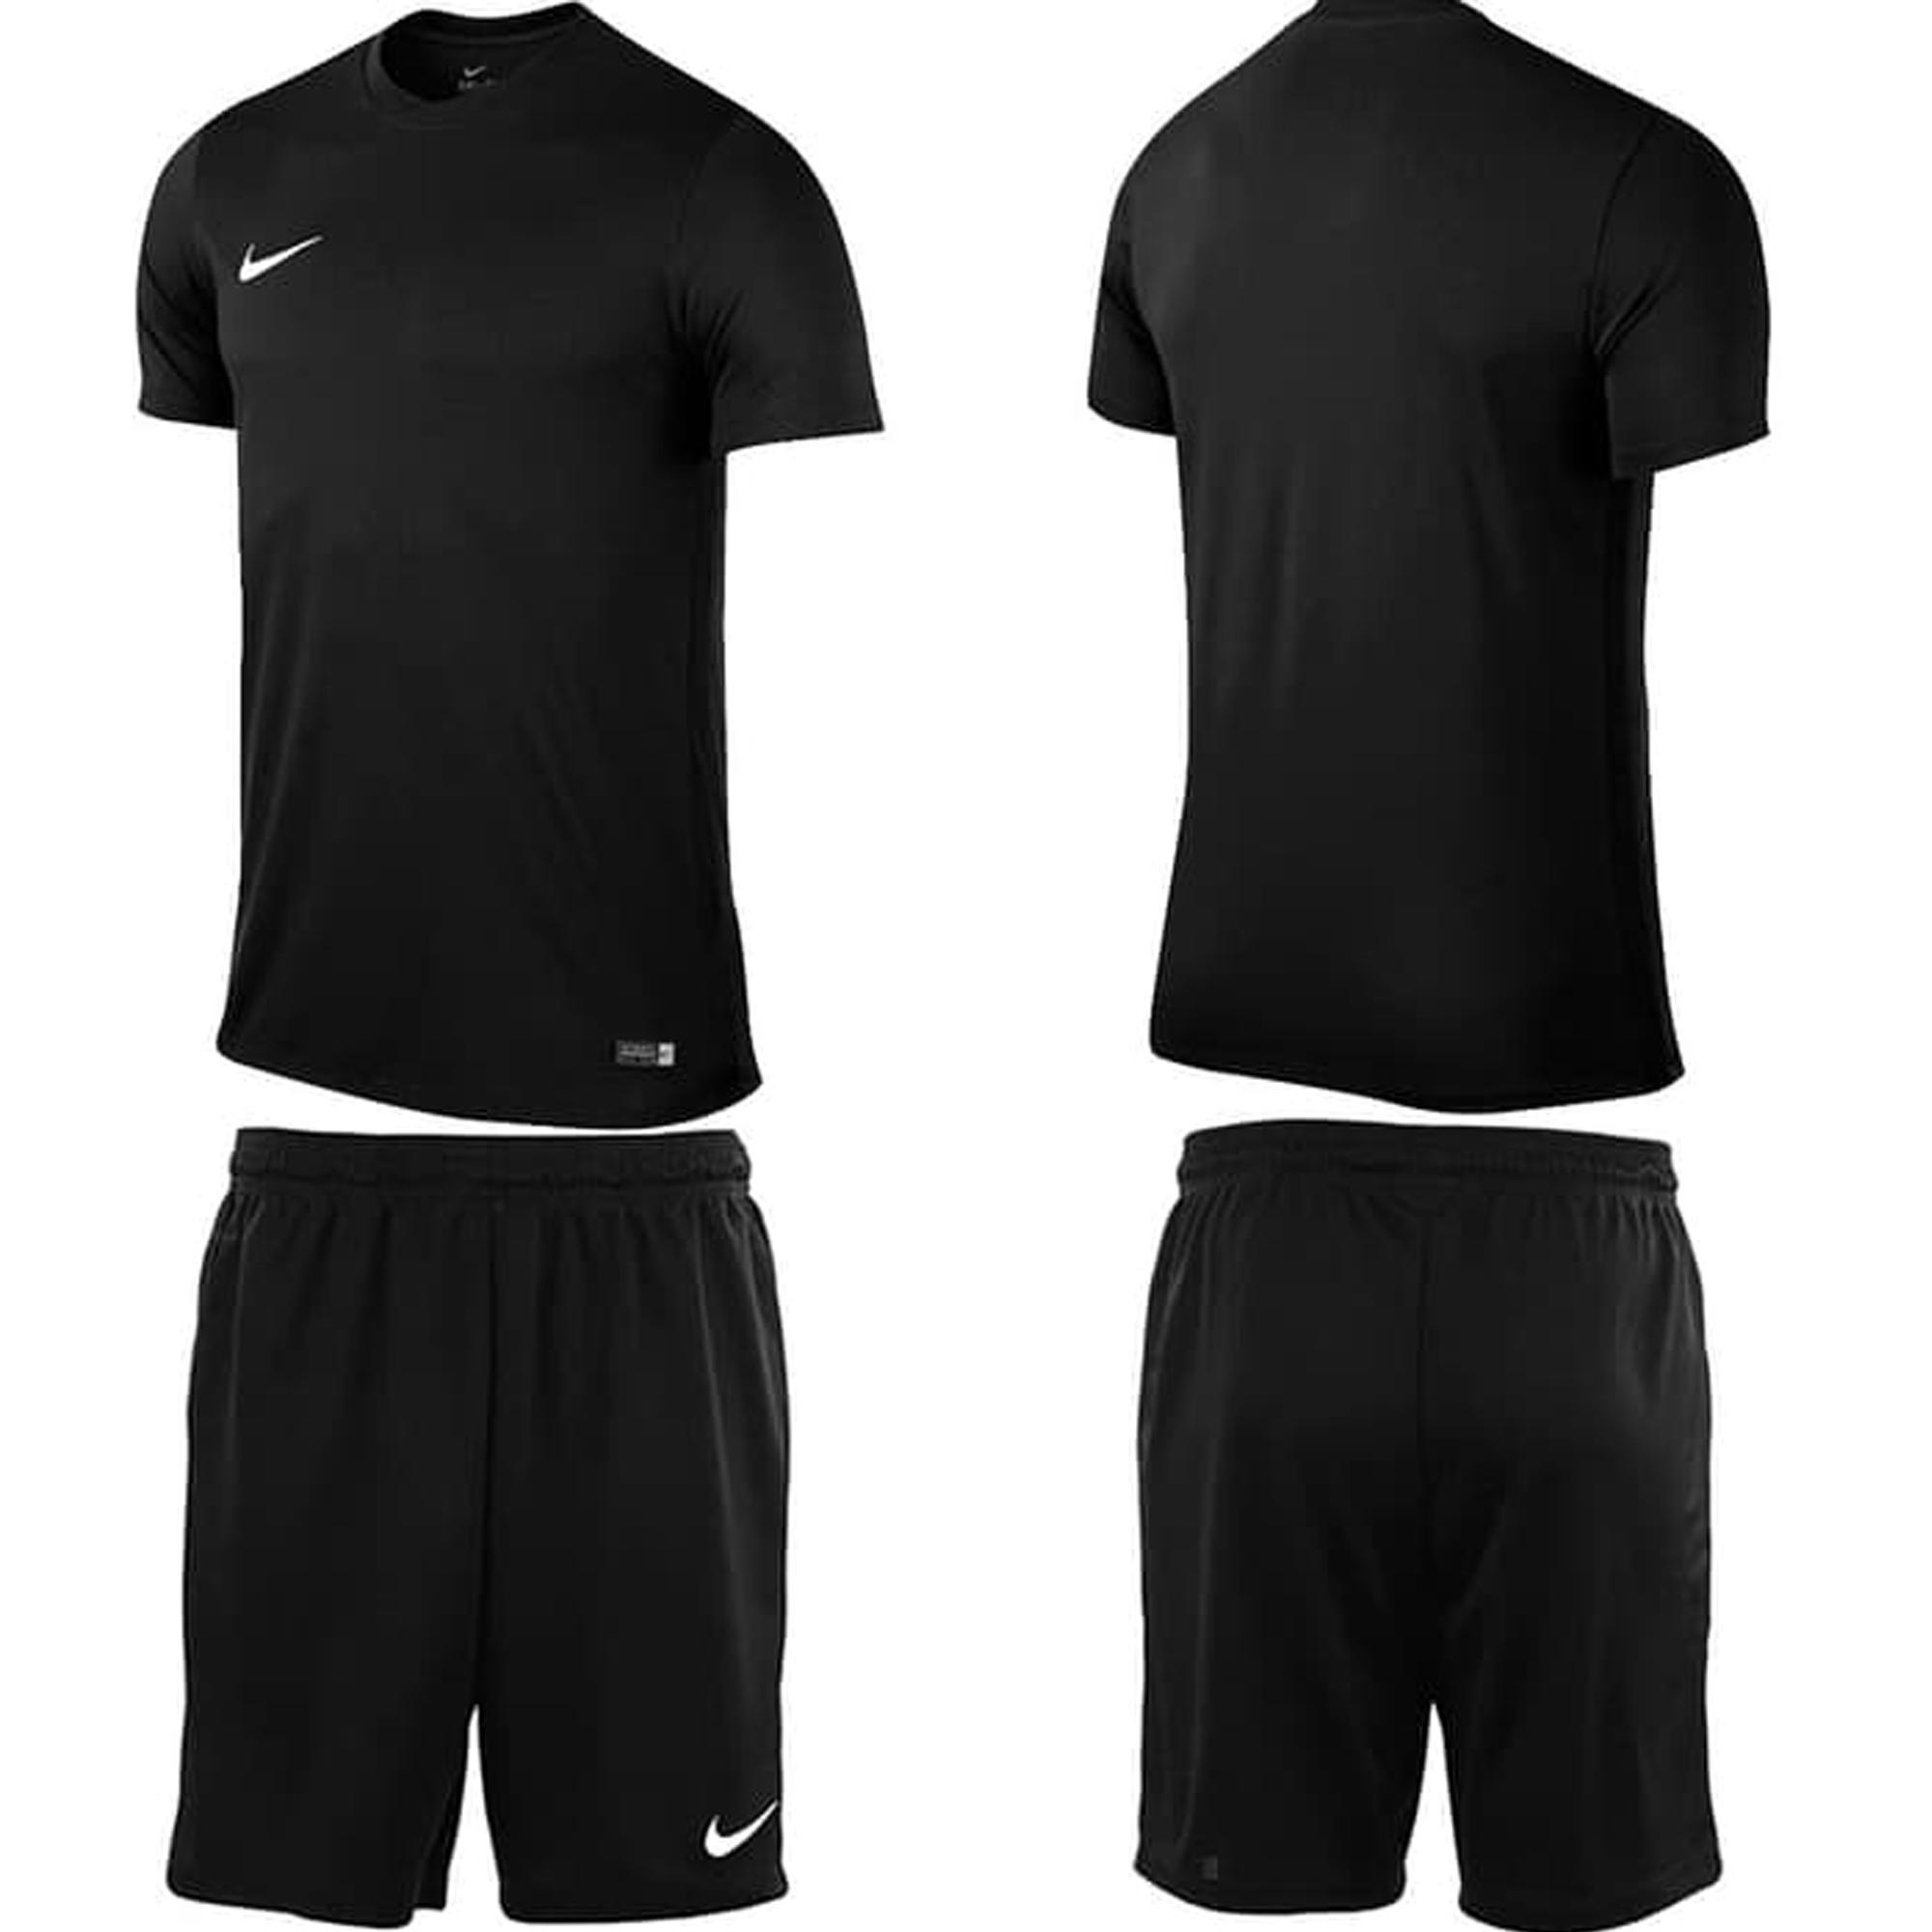 Stelan Baju Dan Celana Drifit Dan Celana Legging Panjang Olahraga Futsal Sepakbola Murah Lazada Indonesia